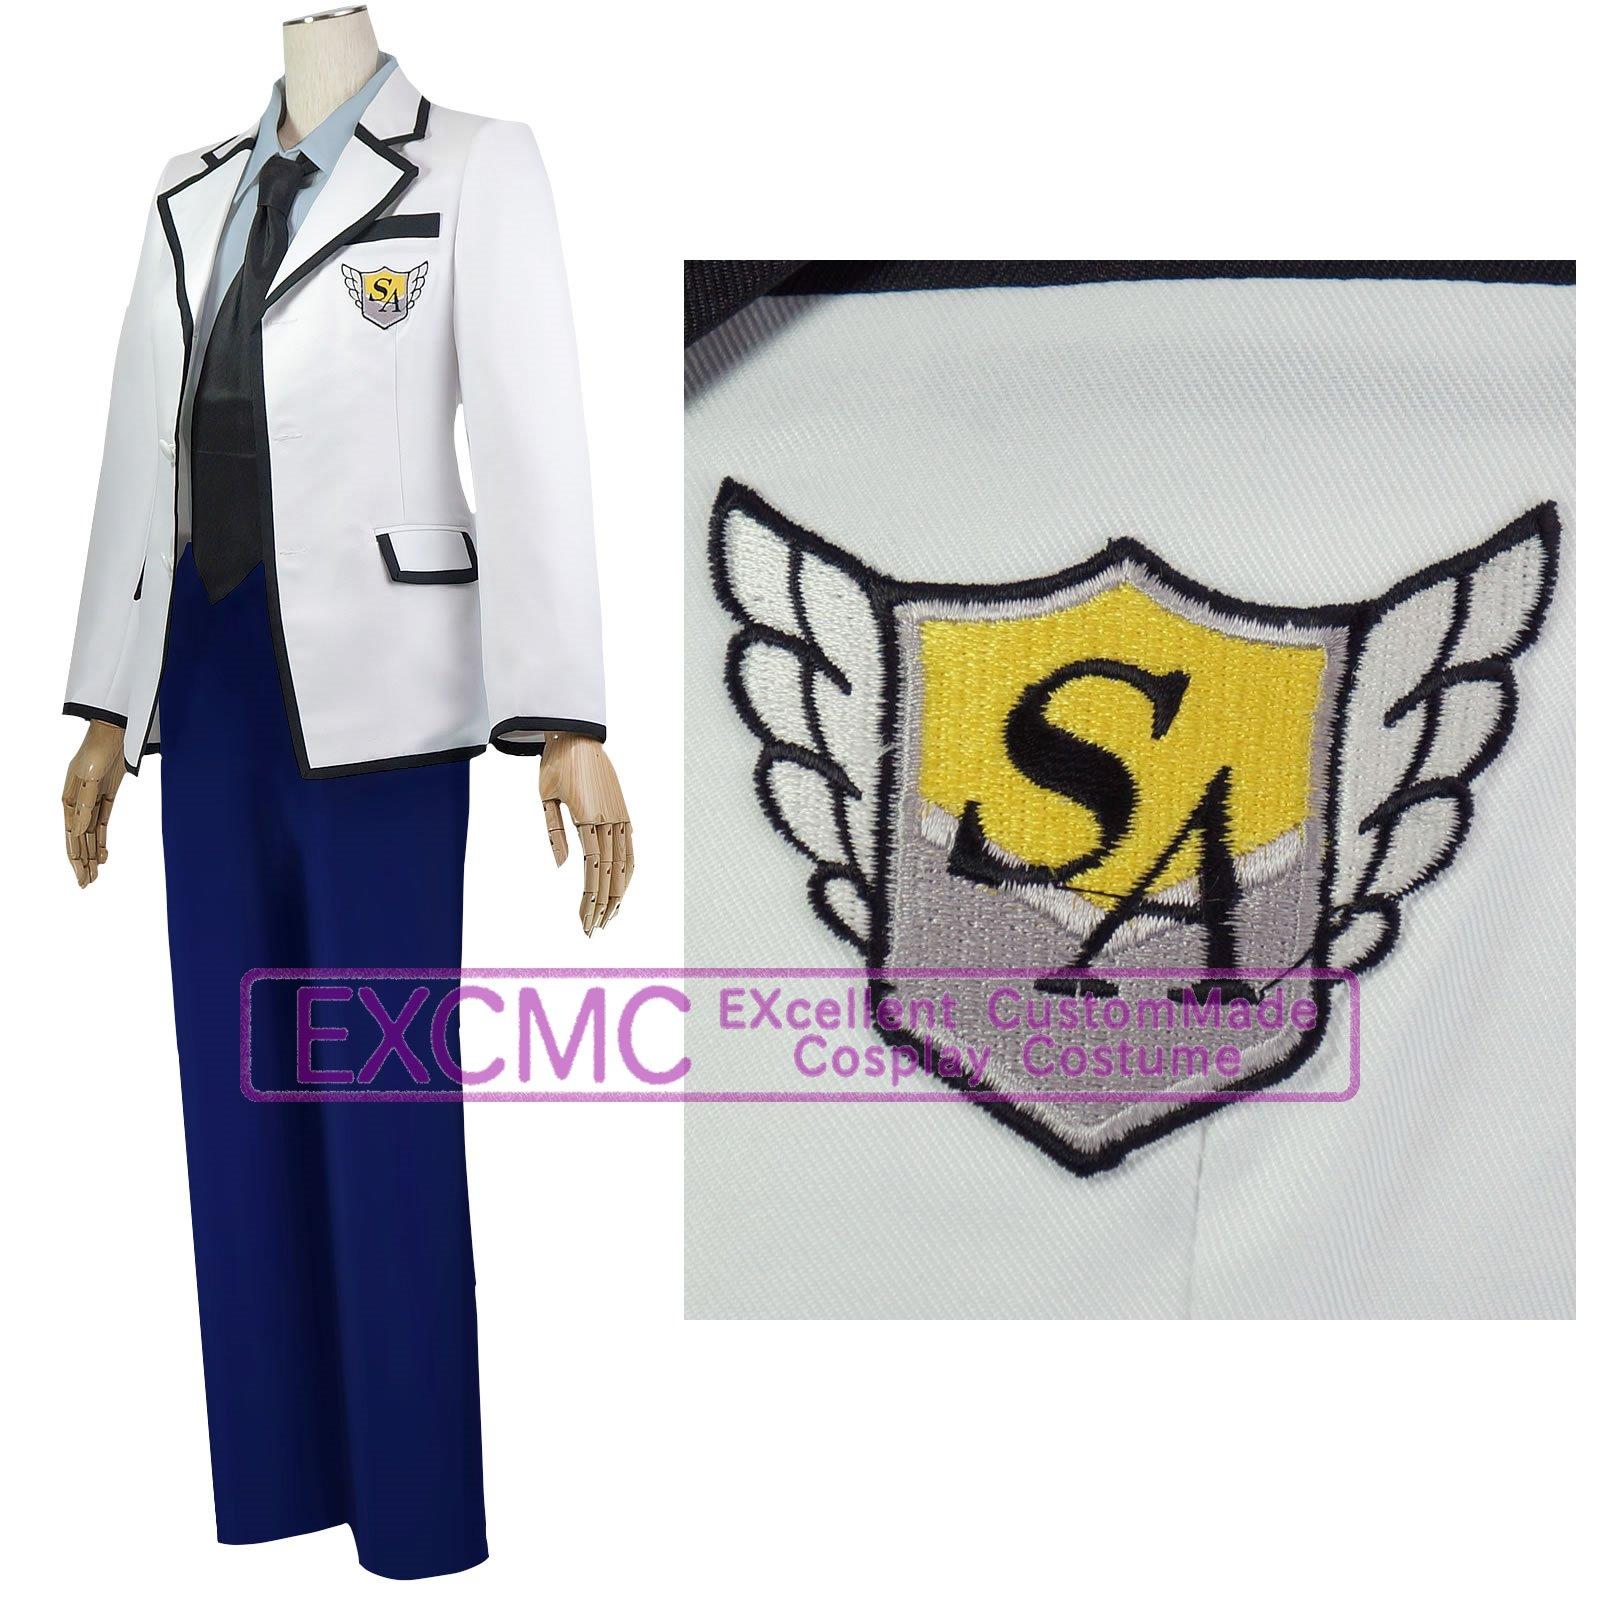 S・A(スペシャル・エー) 白選館高校 男子制服 風 コスプレ衣装3